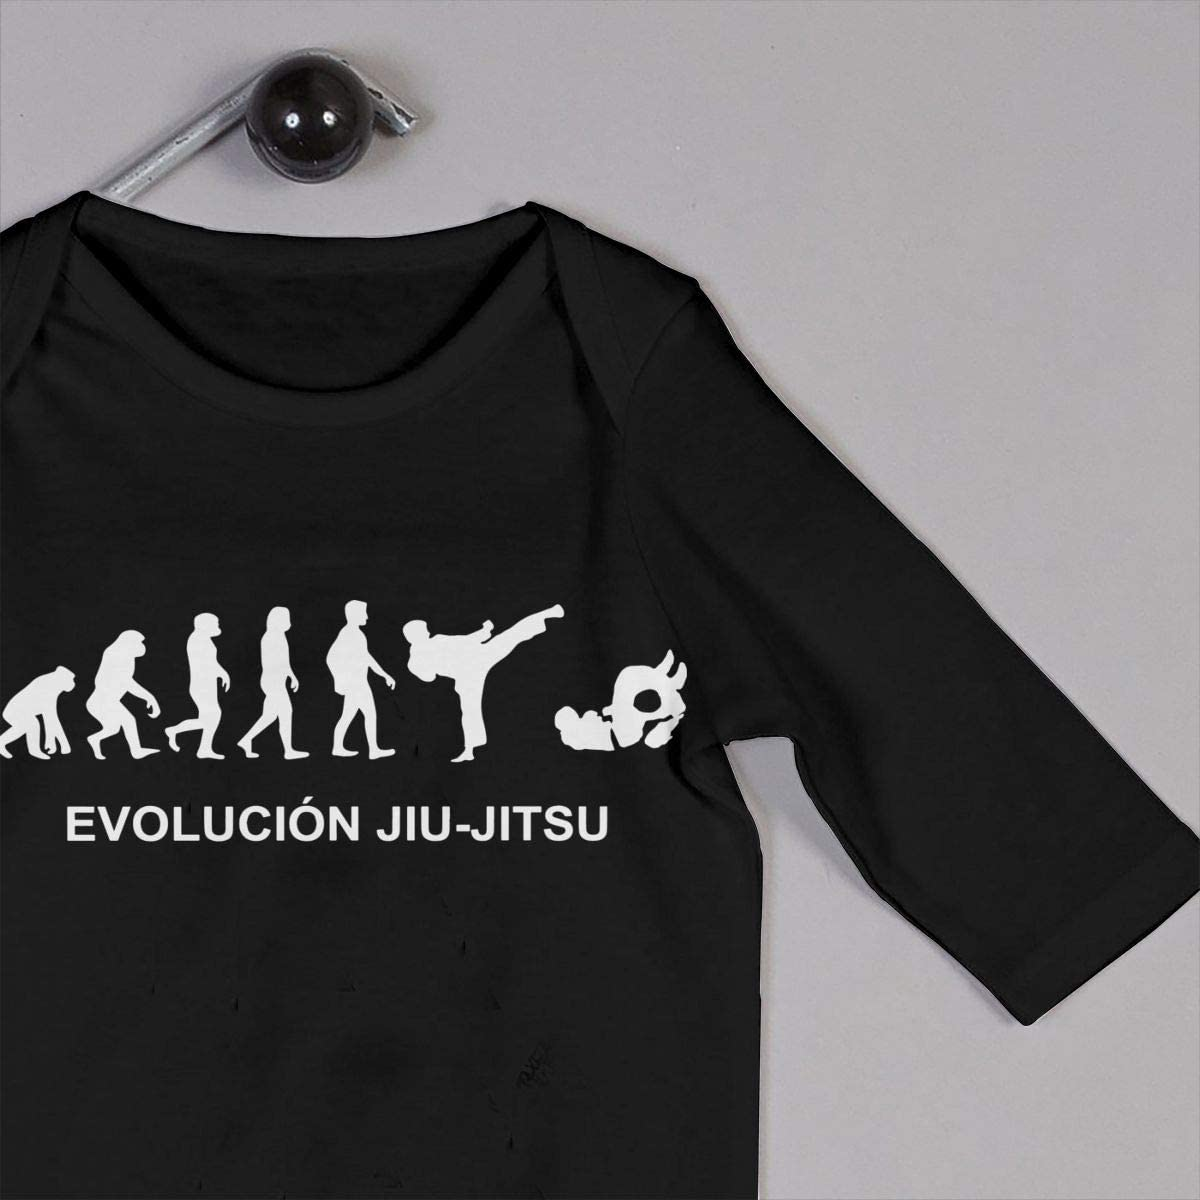 YELTY6F Evolution JIU-Jitsu Printed Newborn Infant Baby Boy Girl One-Piece Suit Long Sleeve Pajamas Black